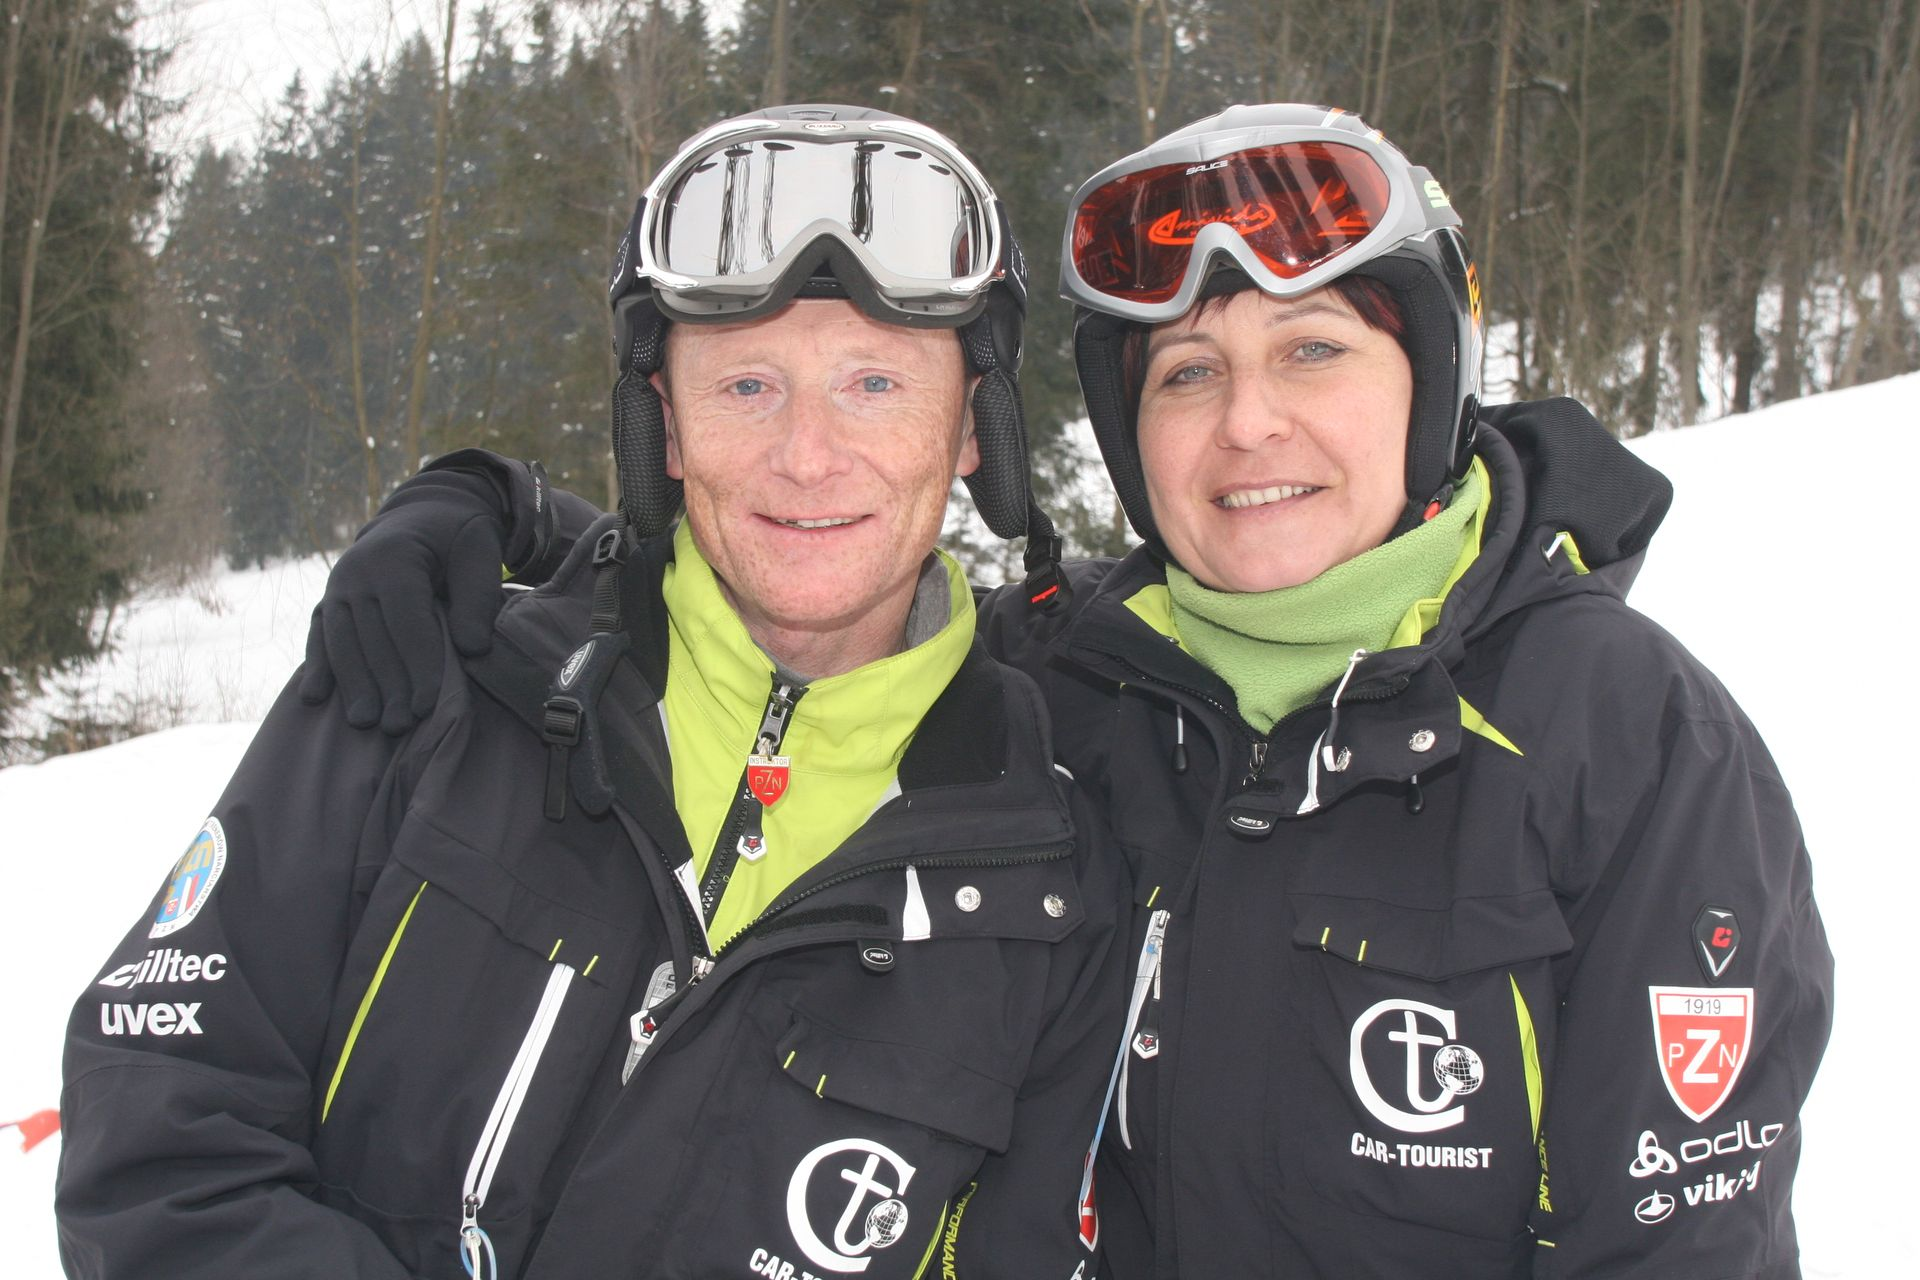 CarTourist_narty-snowboard_2012-foto-27